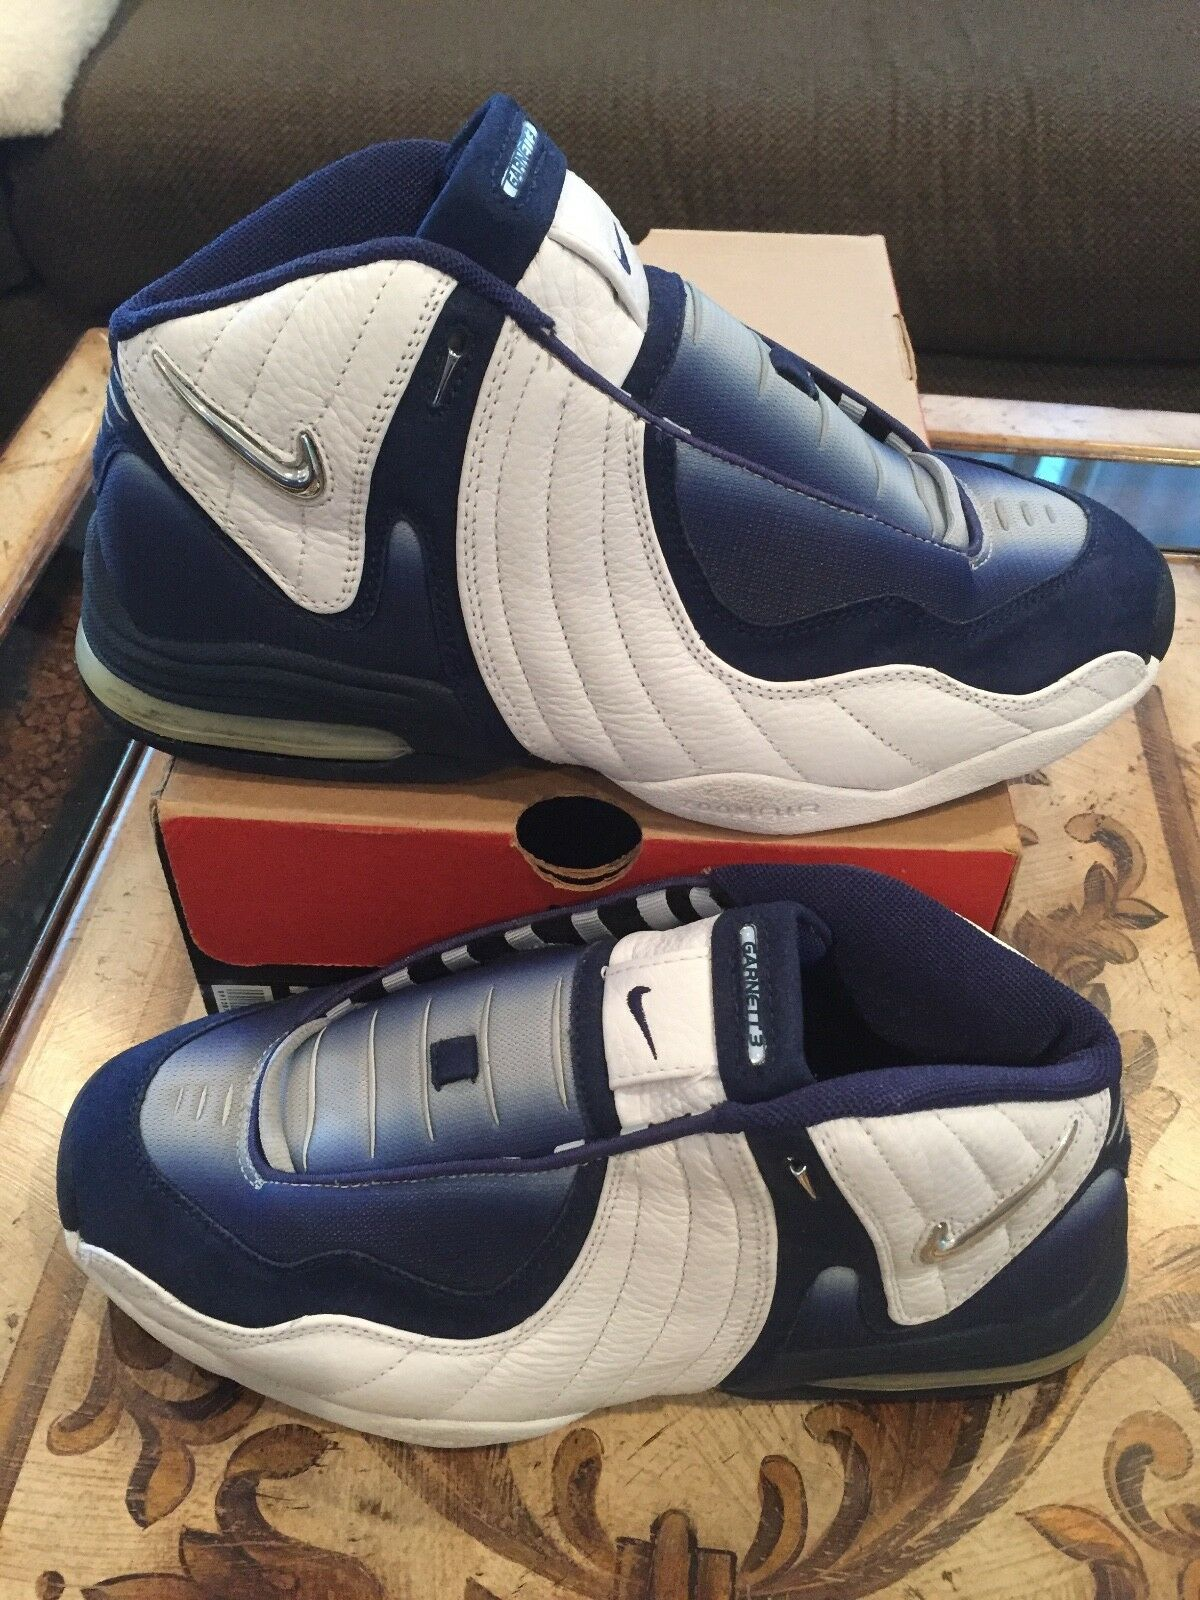 huge discount 6429c 09e5f Nike basketball Sneakers talla talla talla 10,5 nueva marca de Kevin  Garnett 3 kgiii